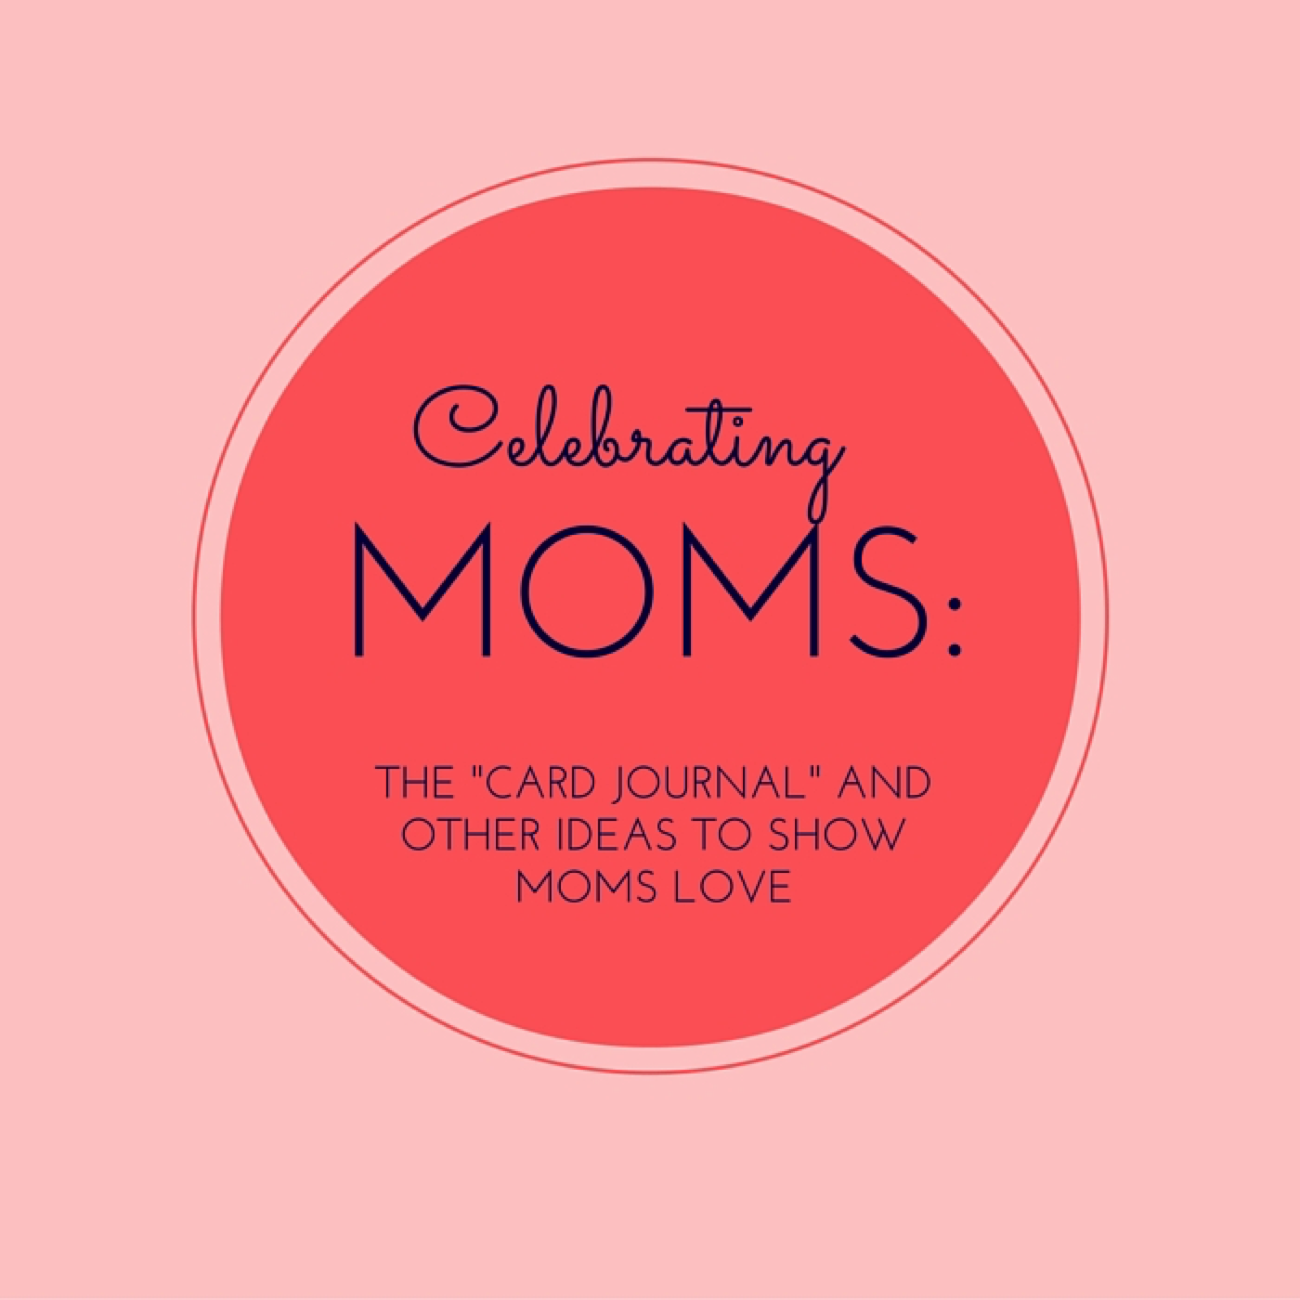 celebrate_moms.png